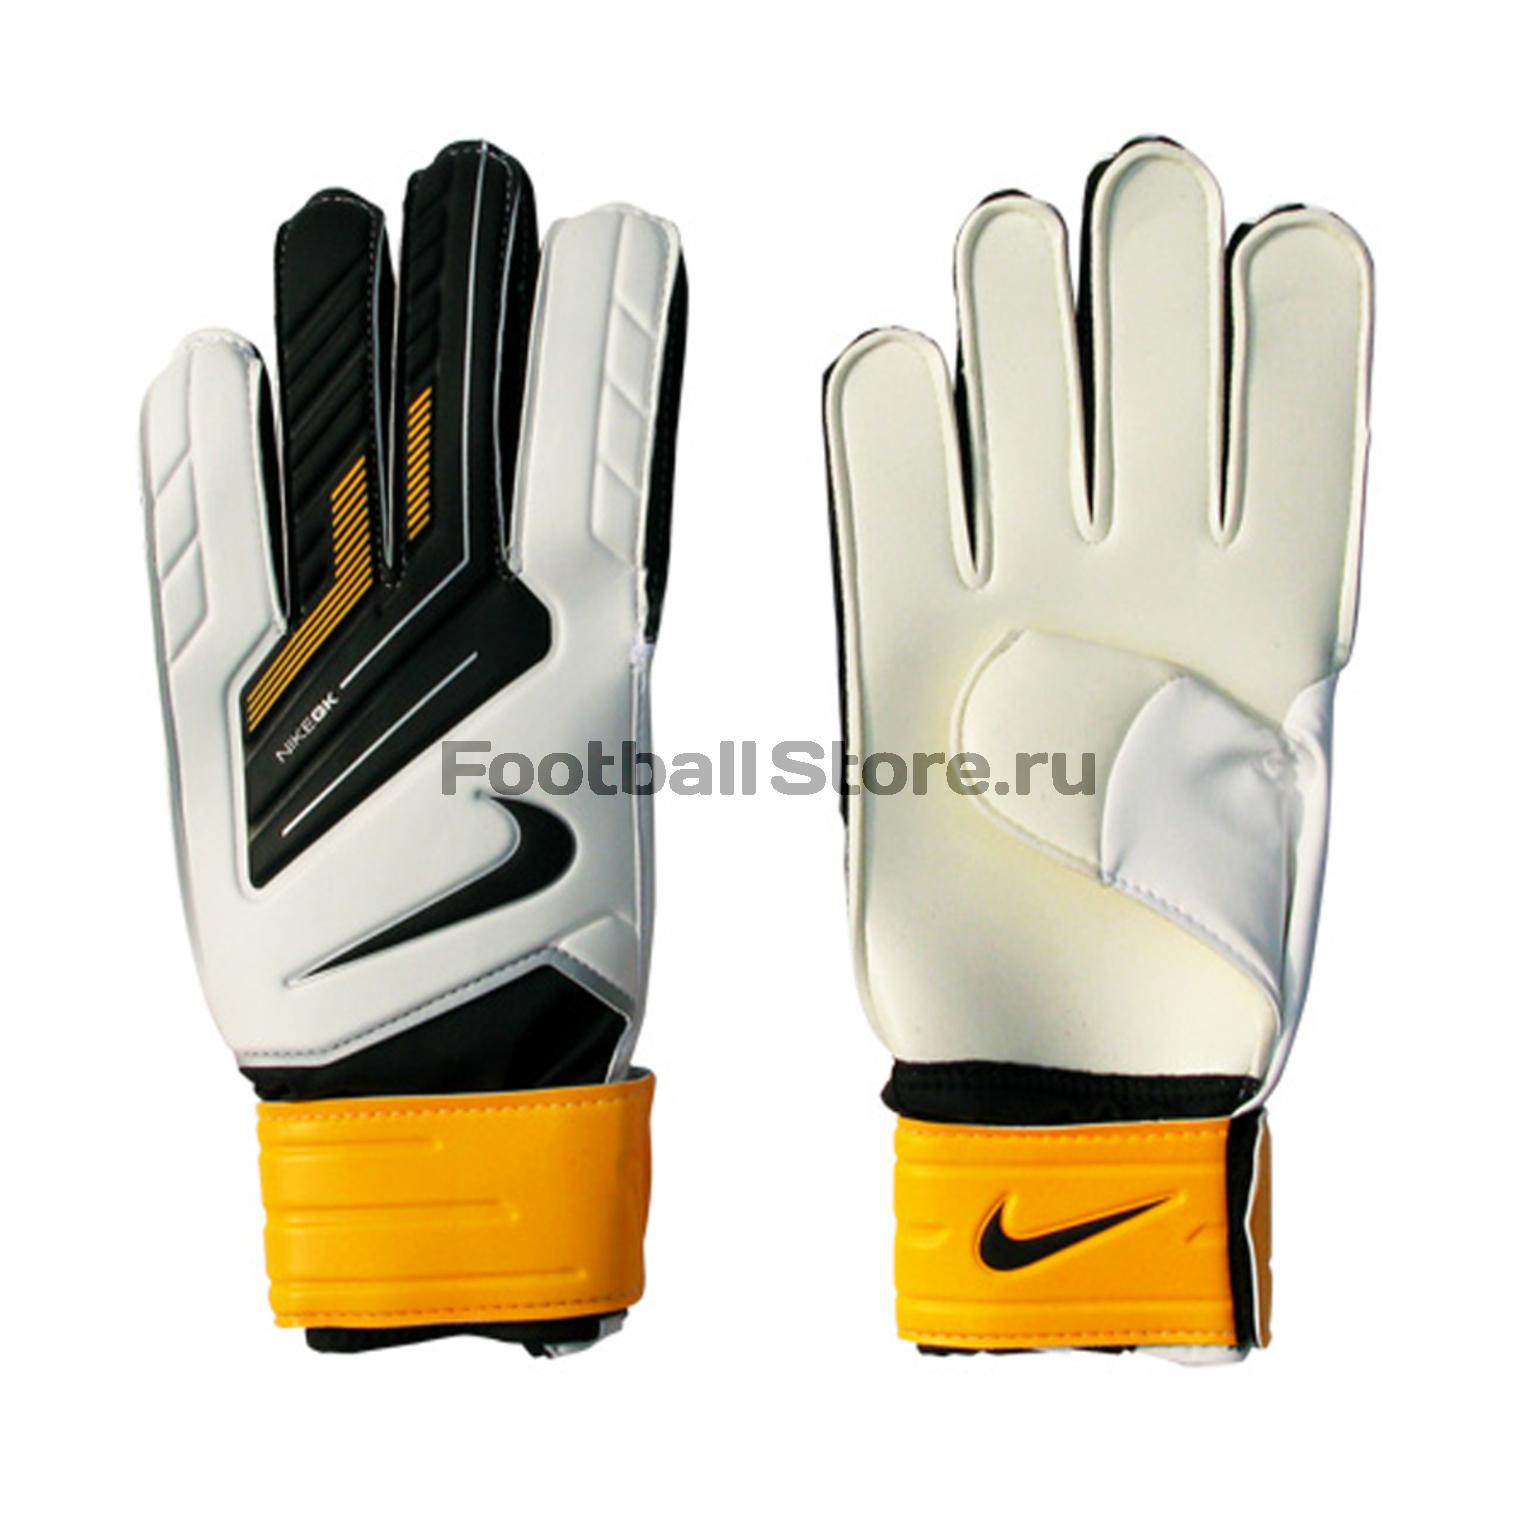 Перчатки Nike Вратарские перчатки Nike GK Classic GS0248-189